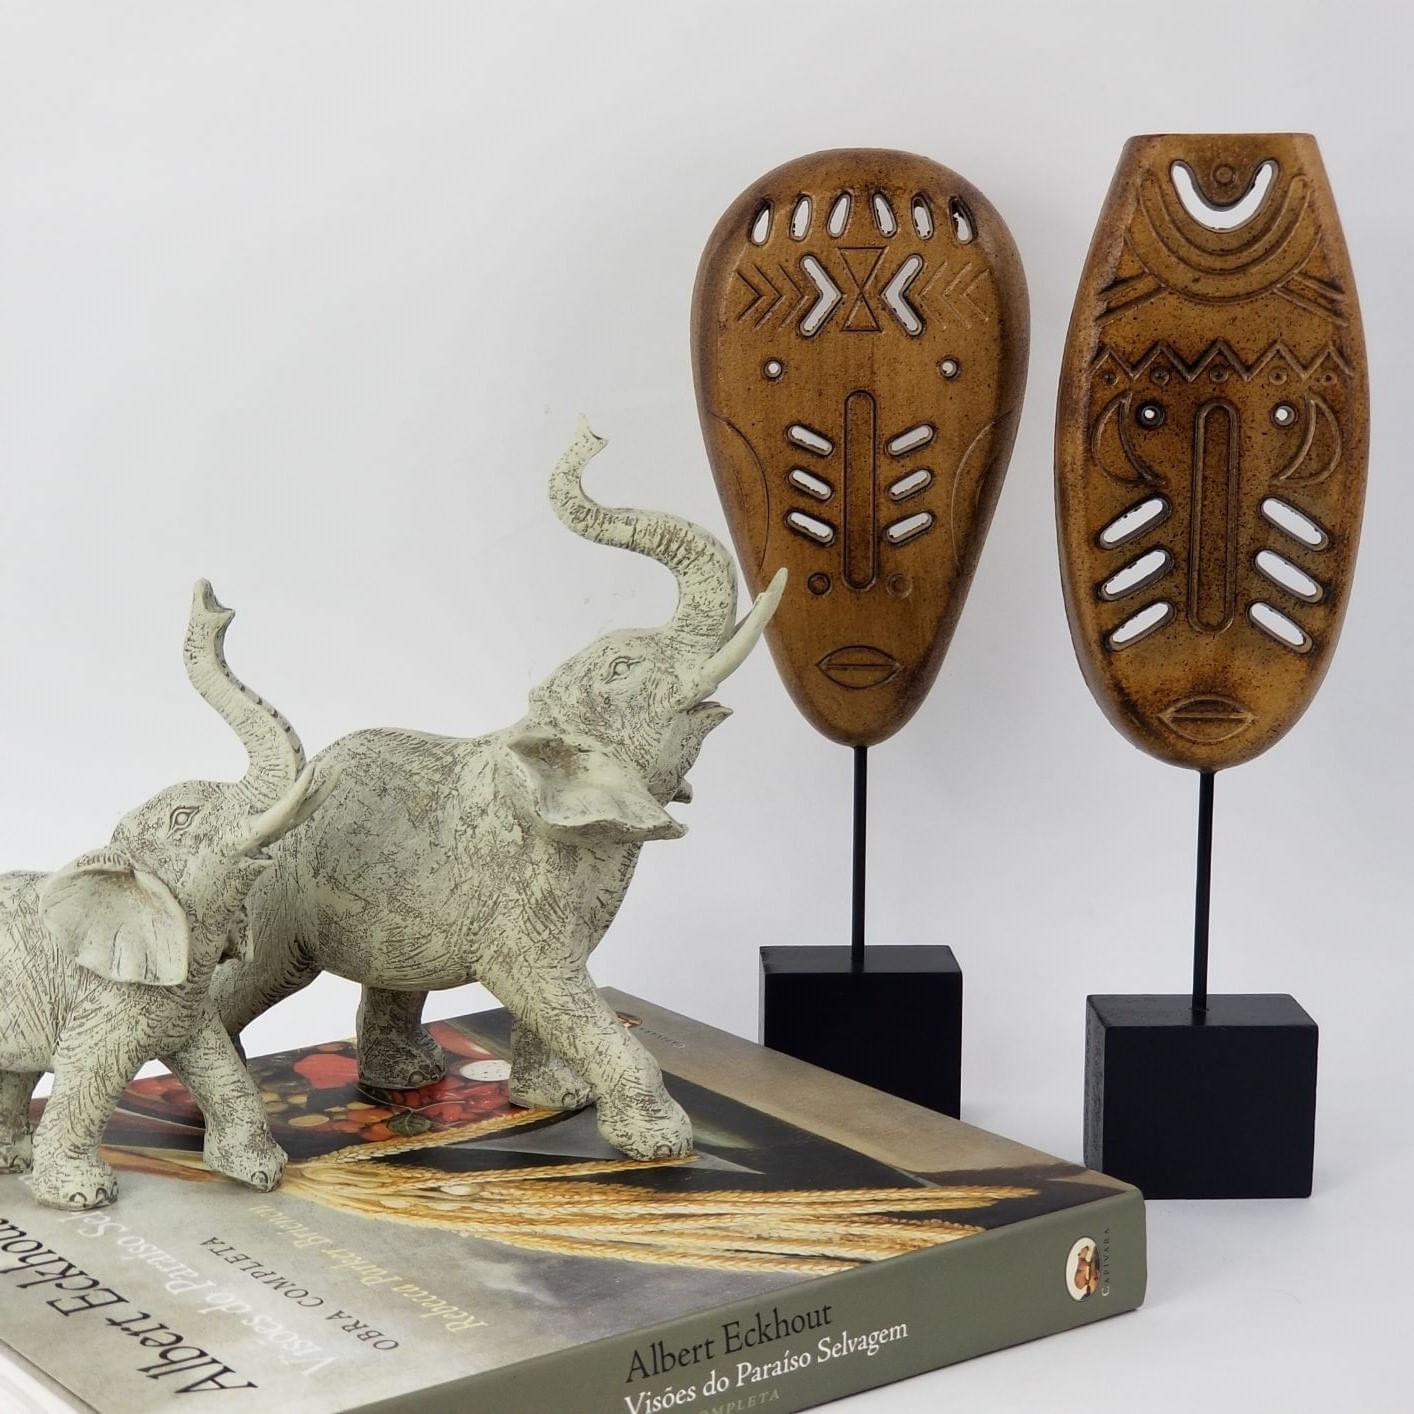 Elefante Decorativo de Resina - Mãe / Grande Cor Cinza